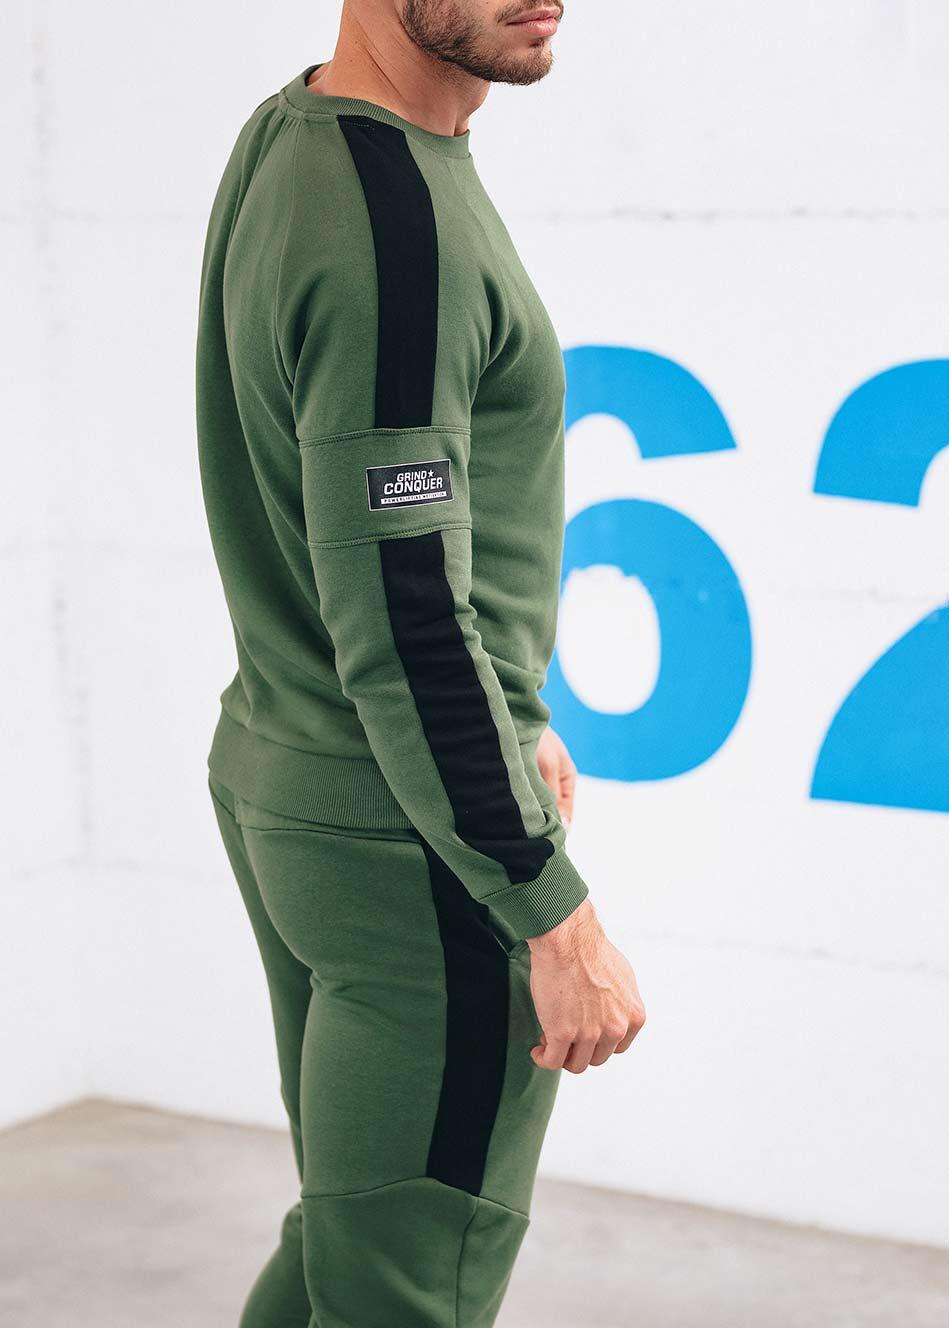 adapt-a-green-sweatshirt-side